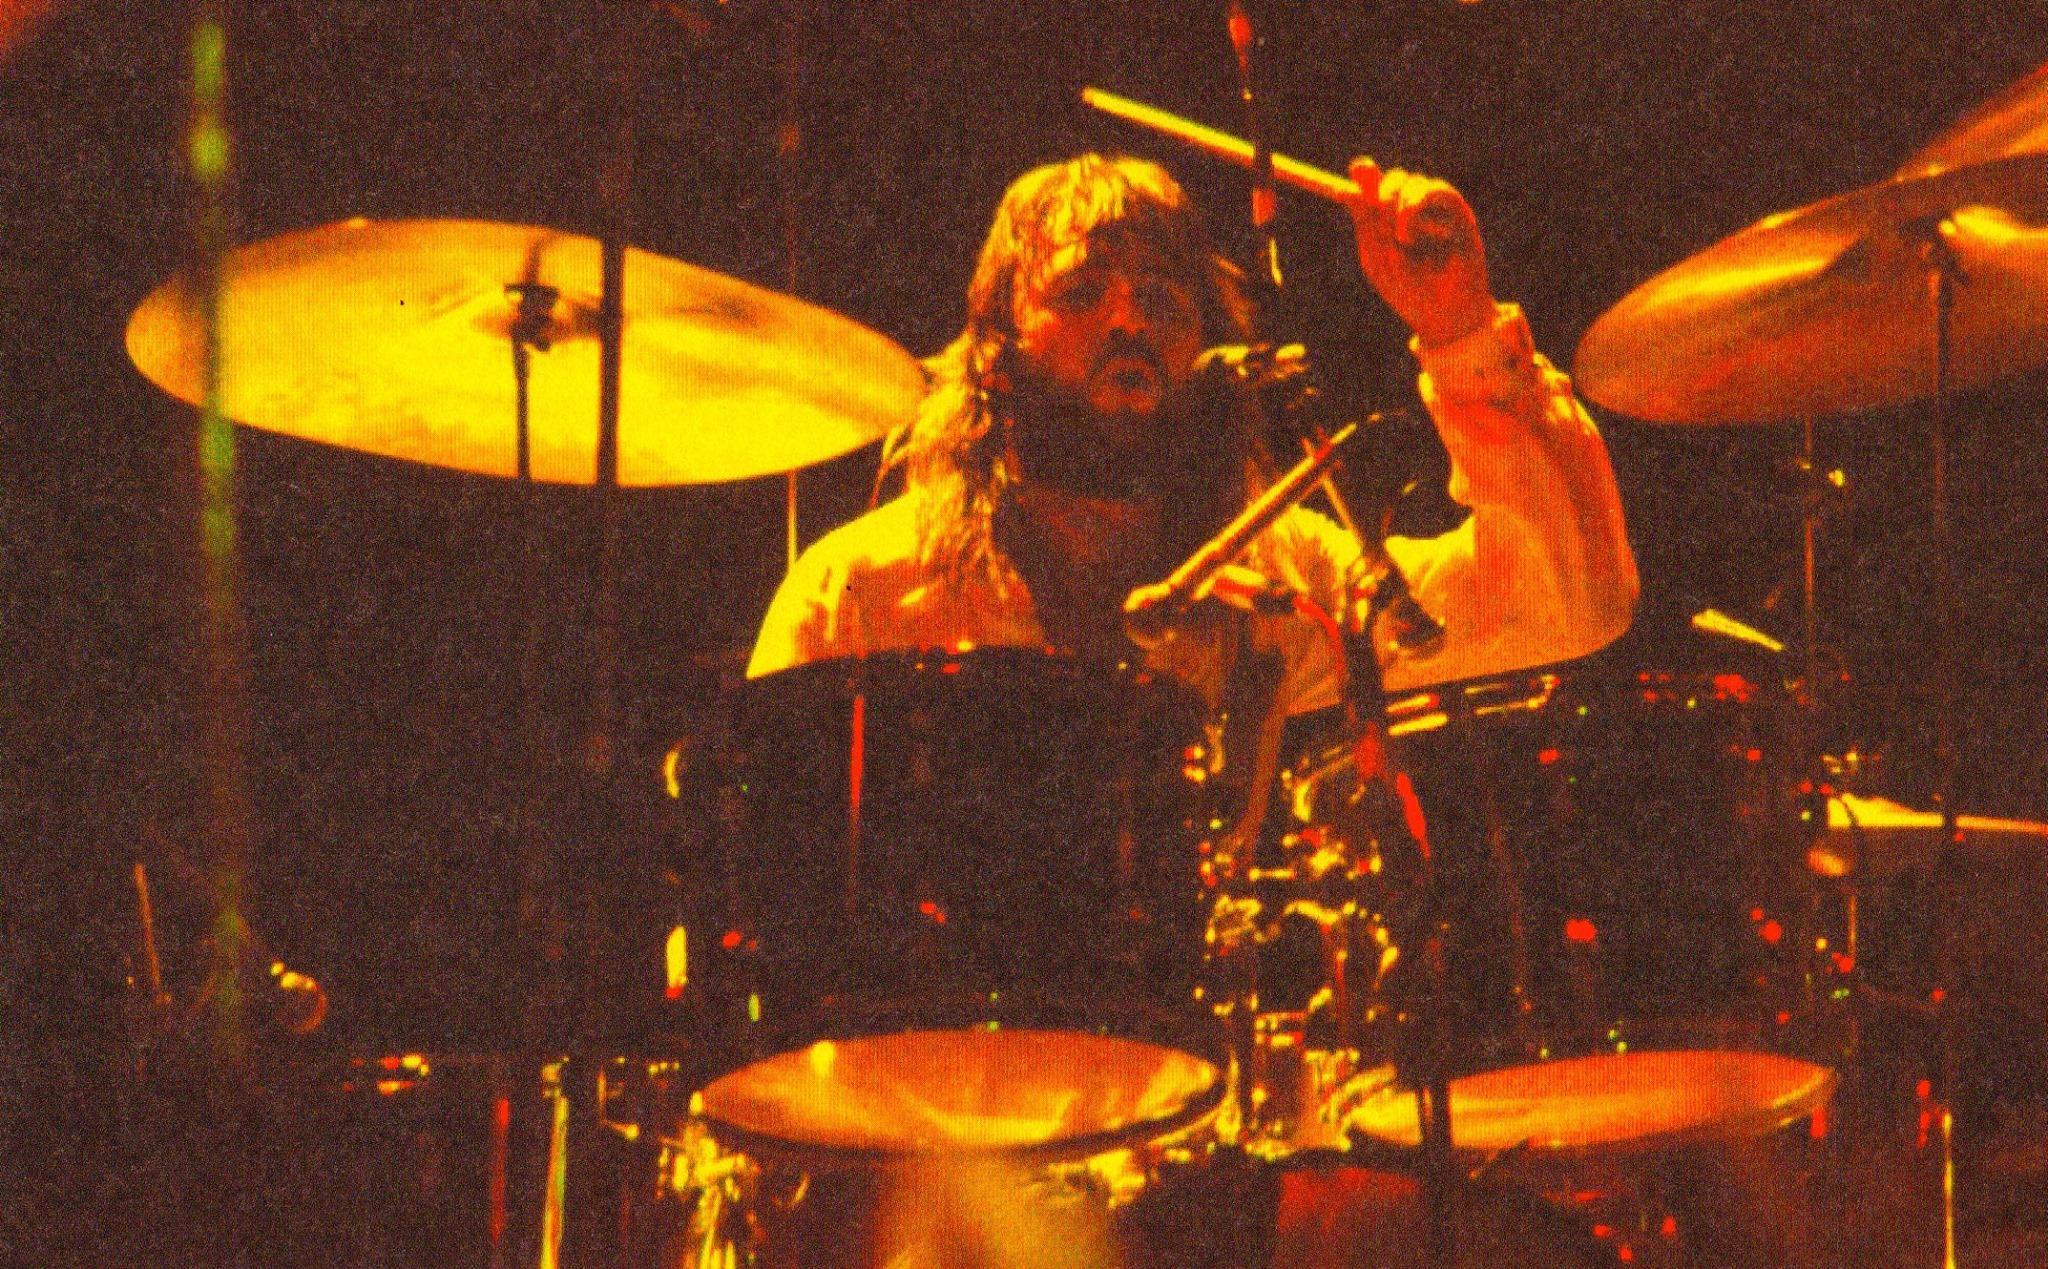 Умер бывший барабанщик Оззи Оcборна и рок-группы Uriah Heep Ли Керслейк